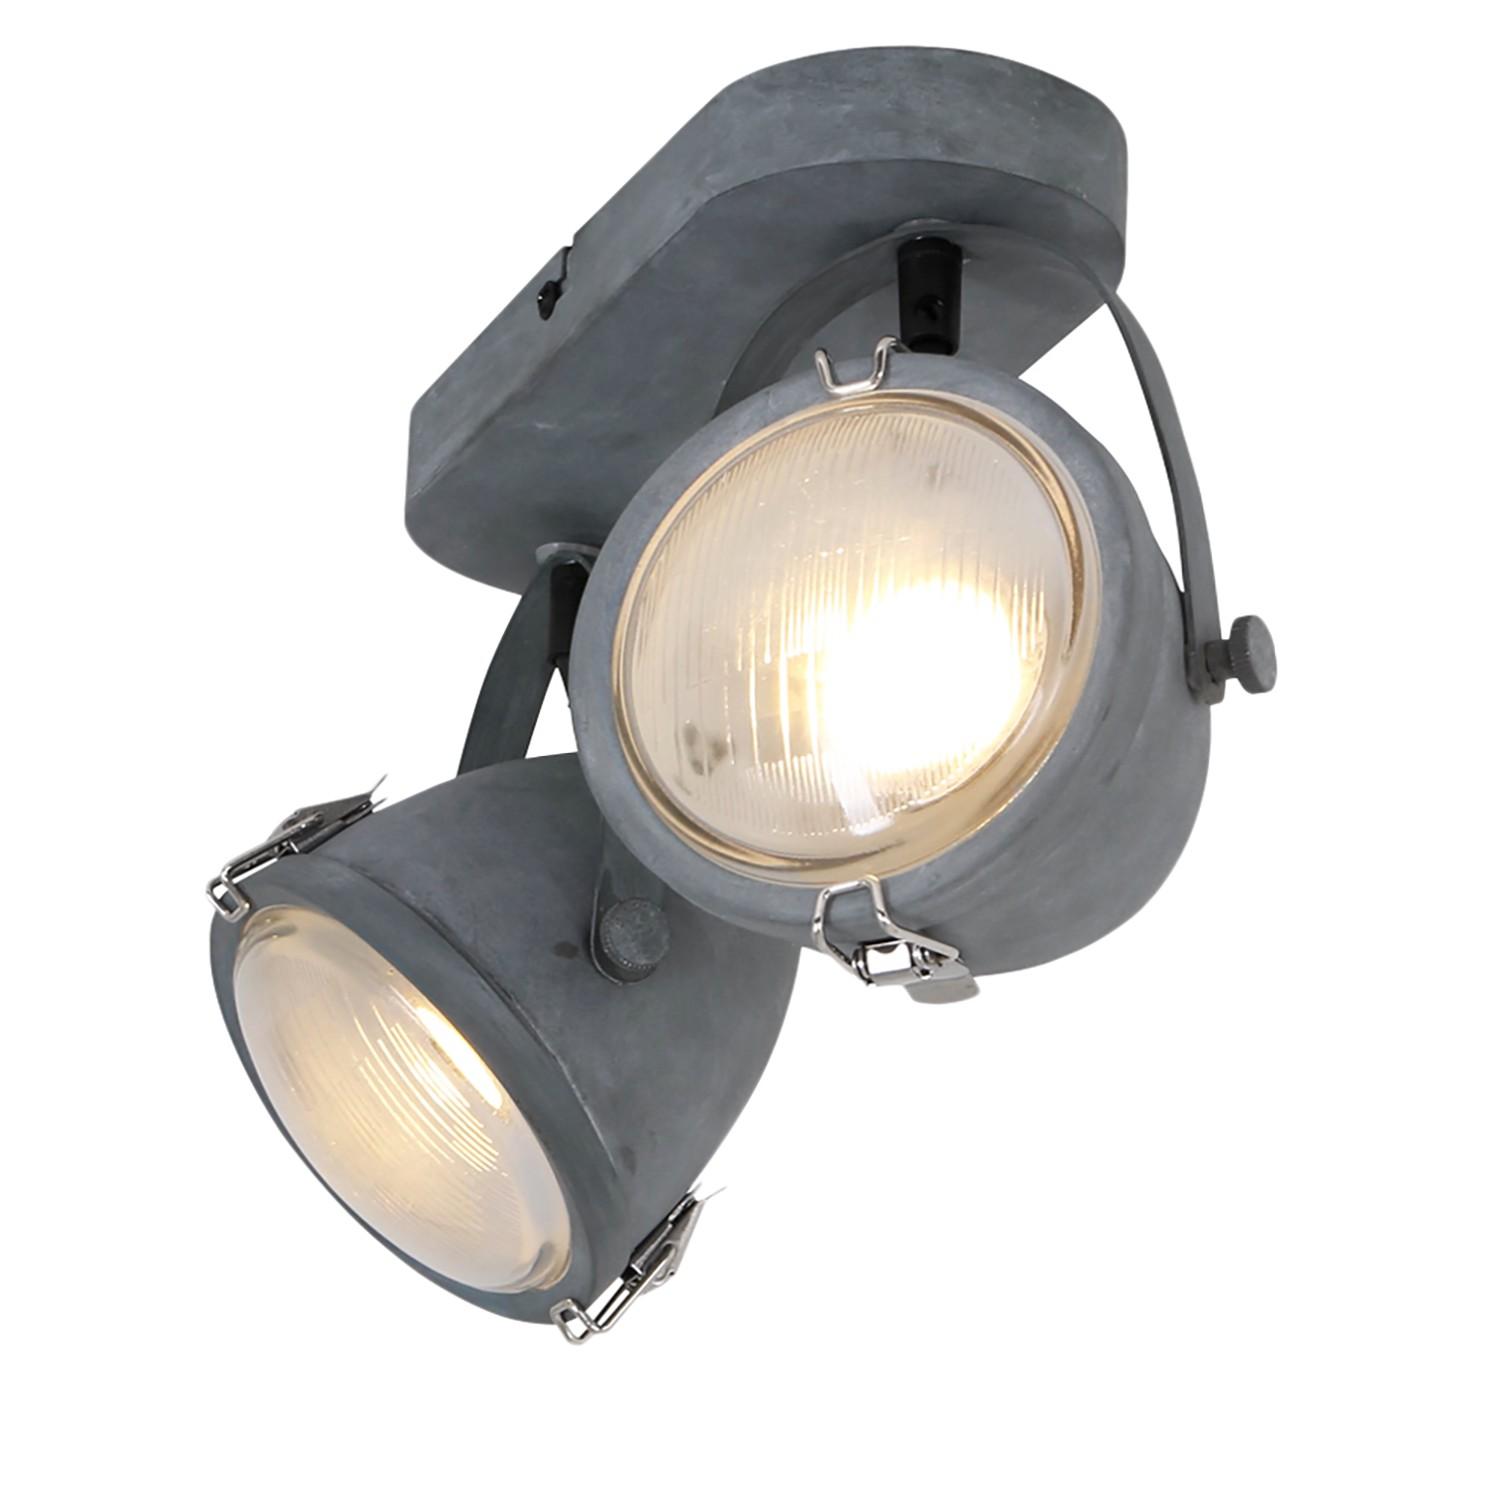 home24 LED-Deckenleuchte Mexlite